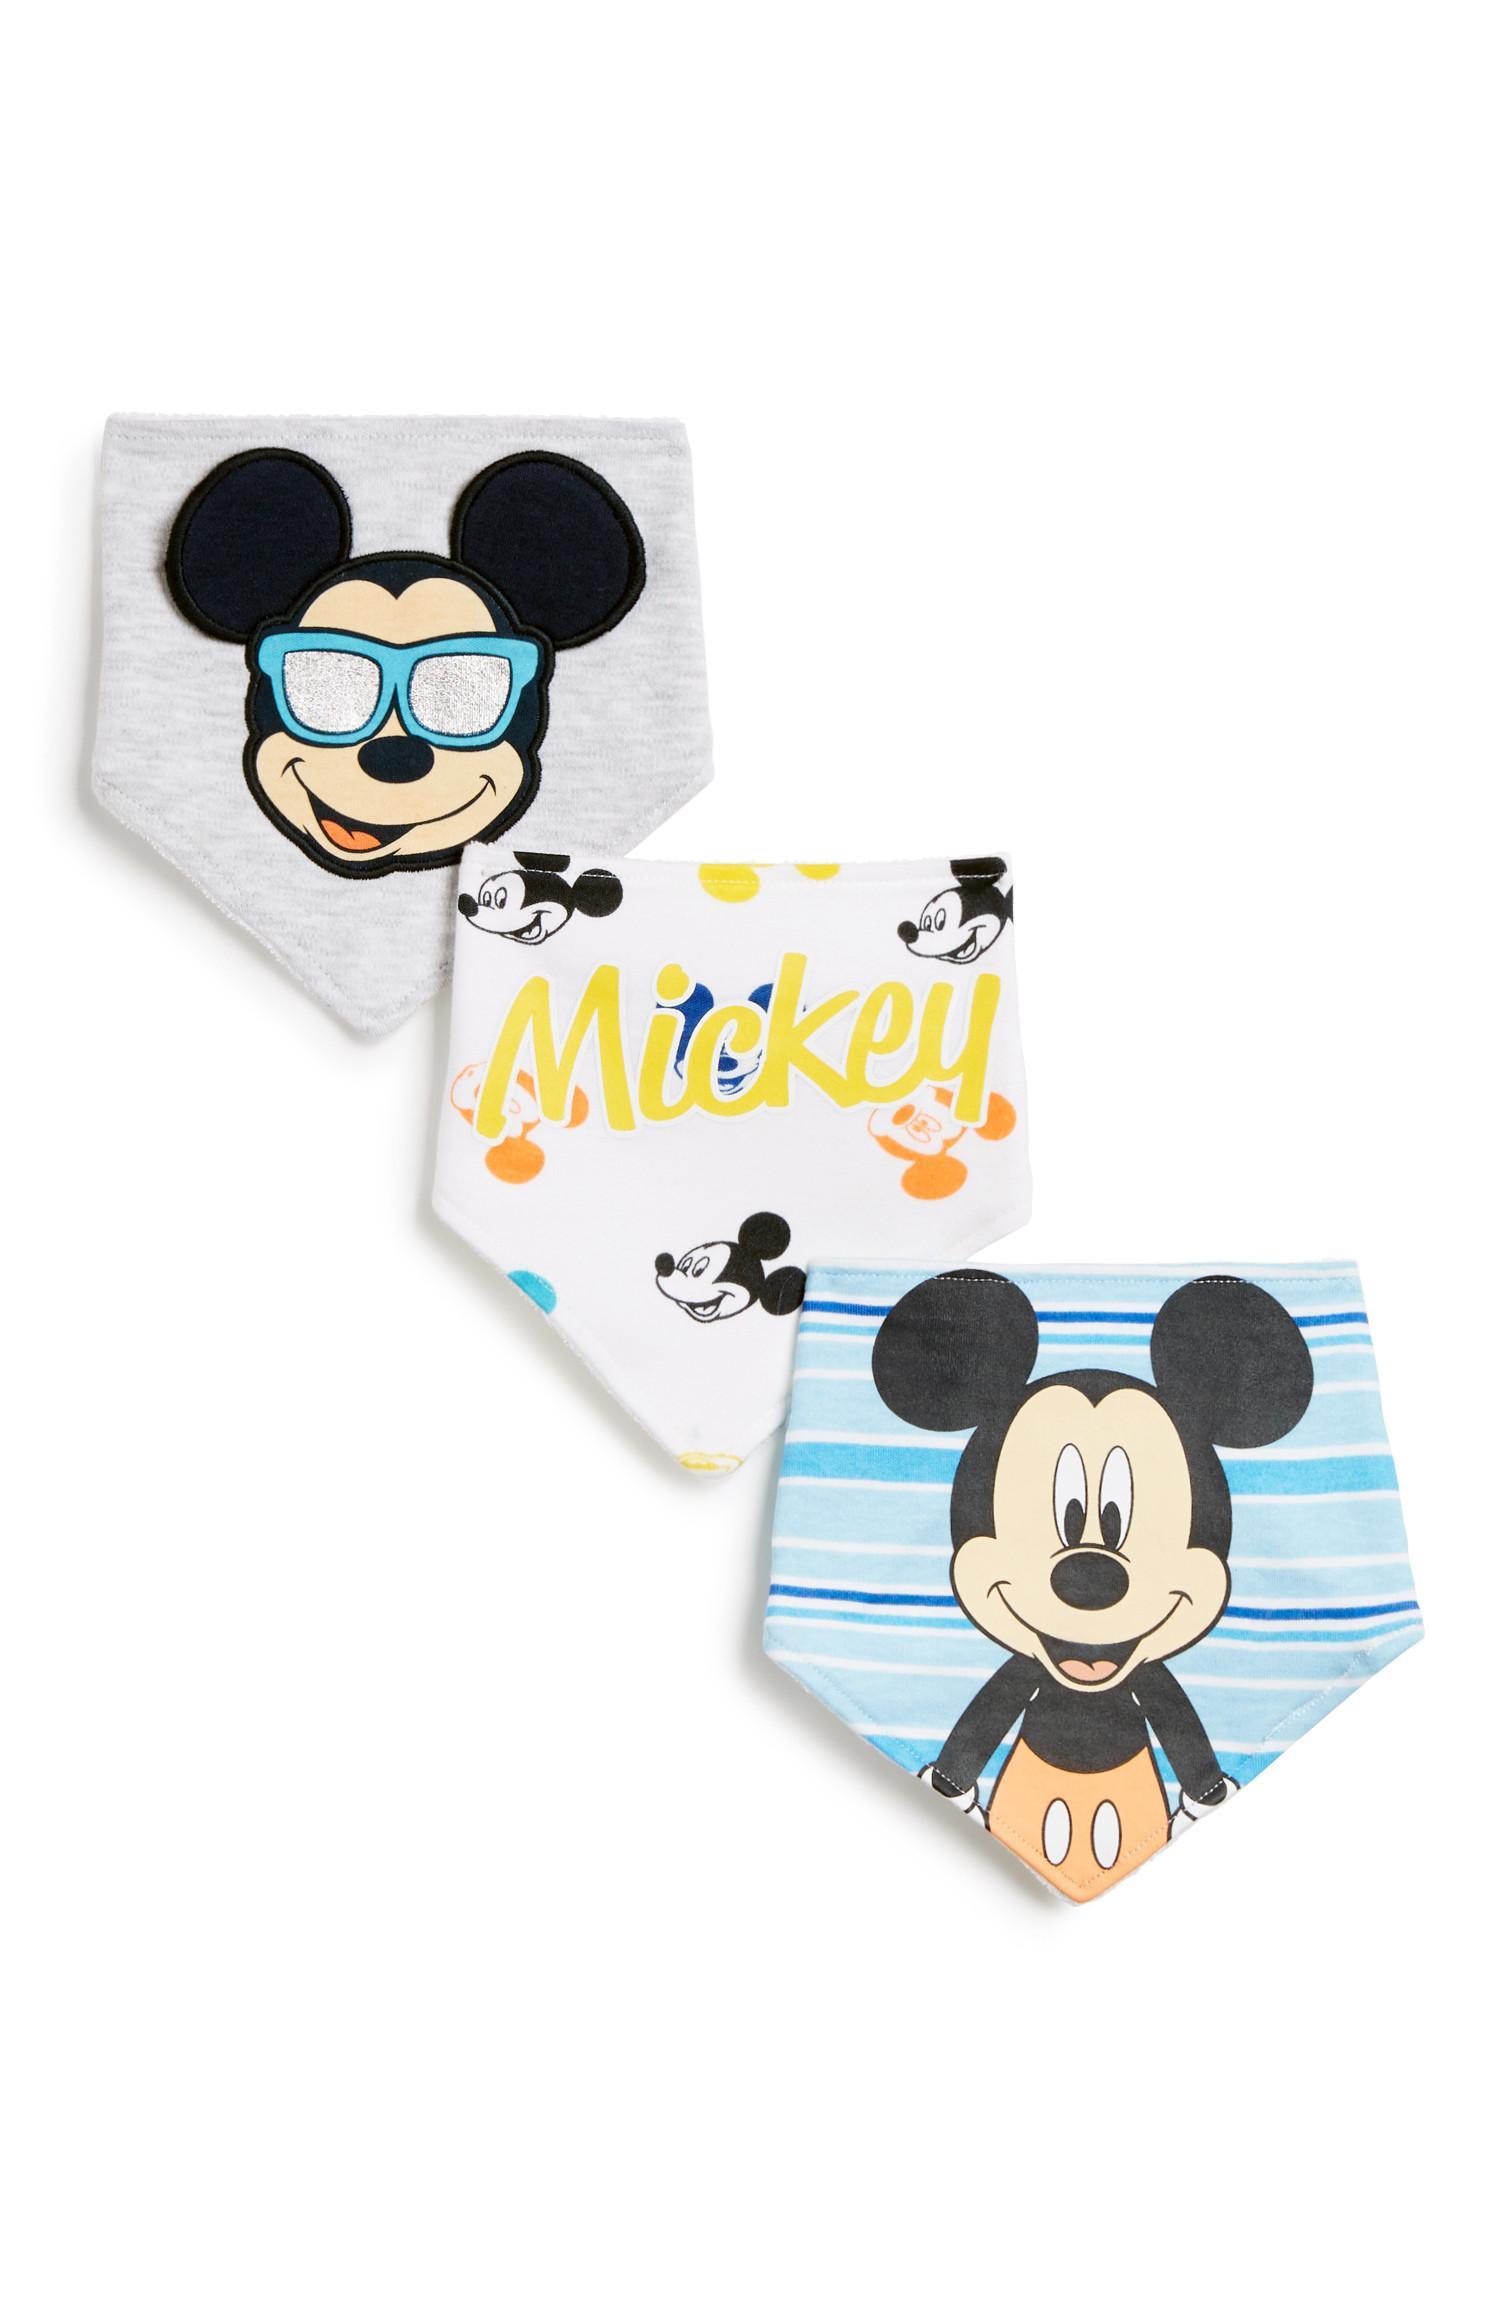 Mickey Mouse Bandana 3Pk